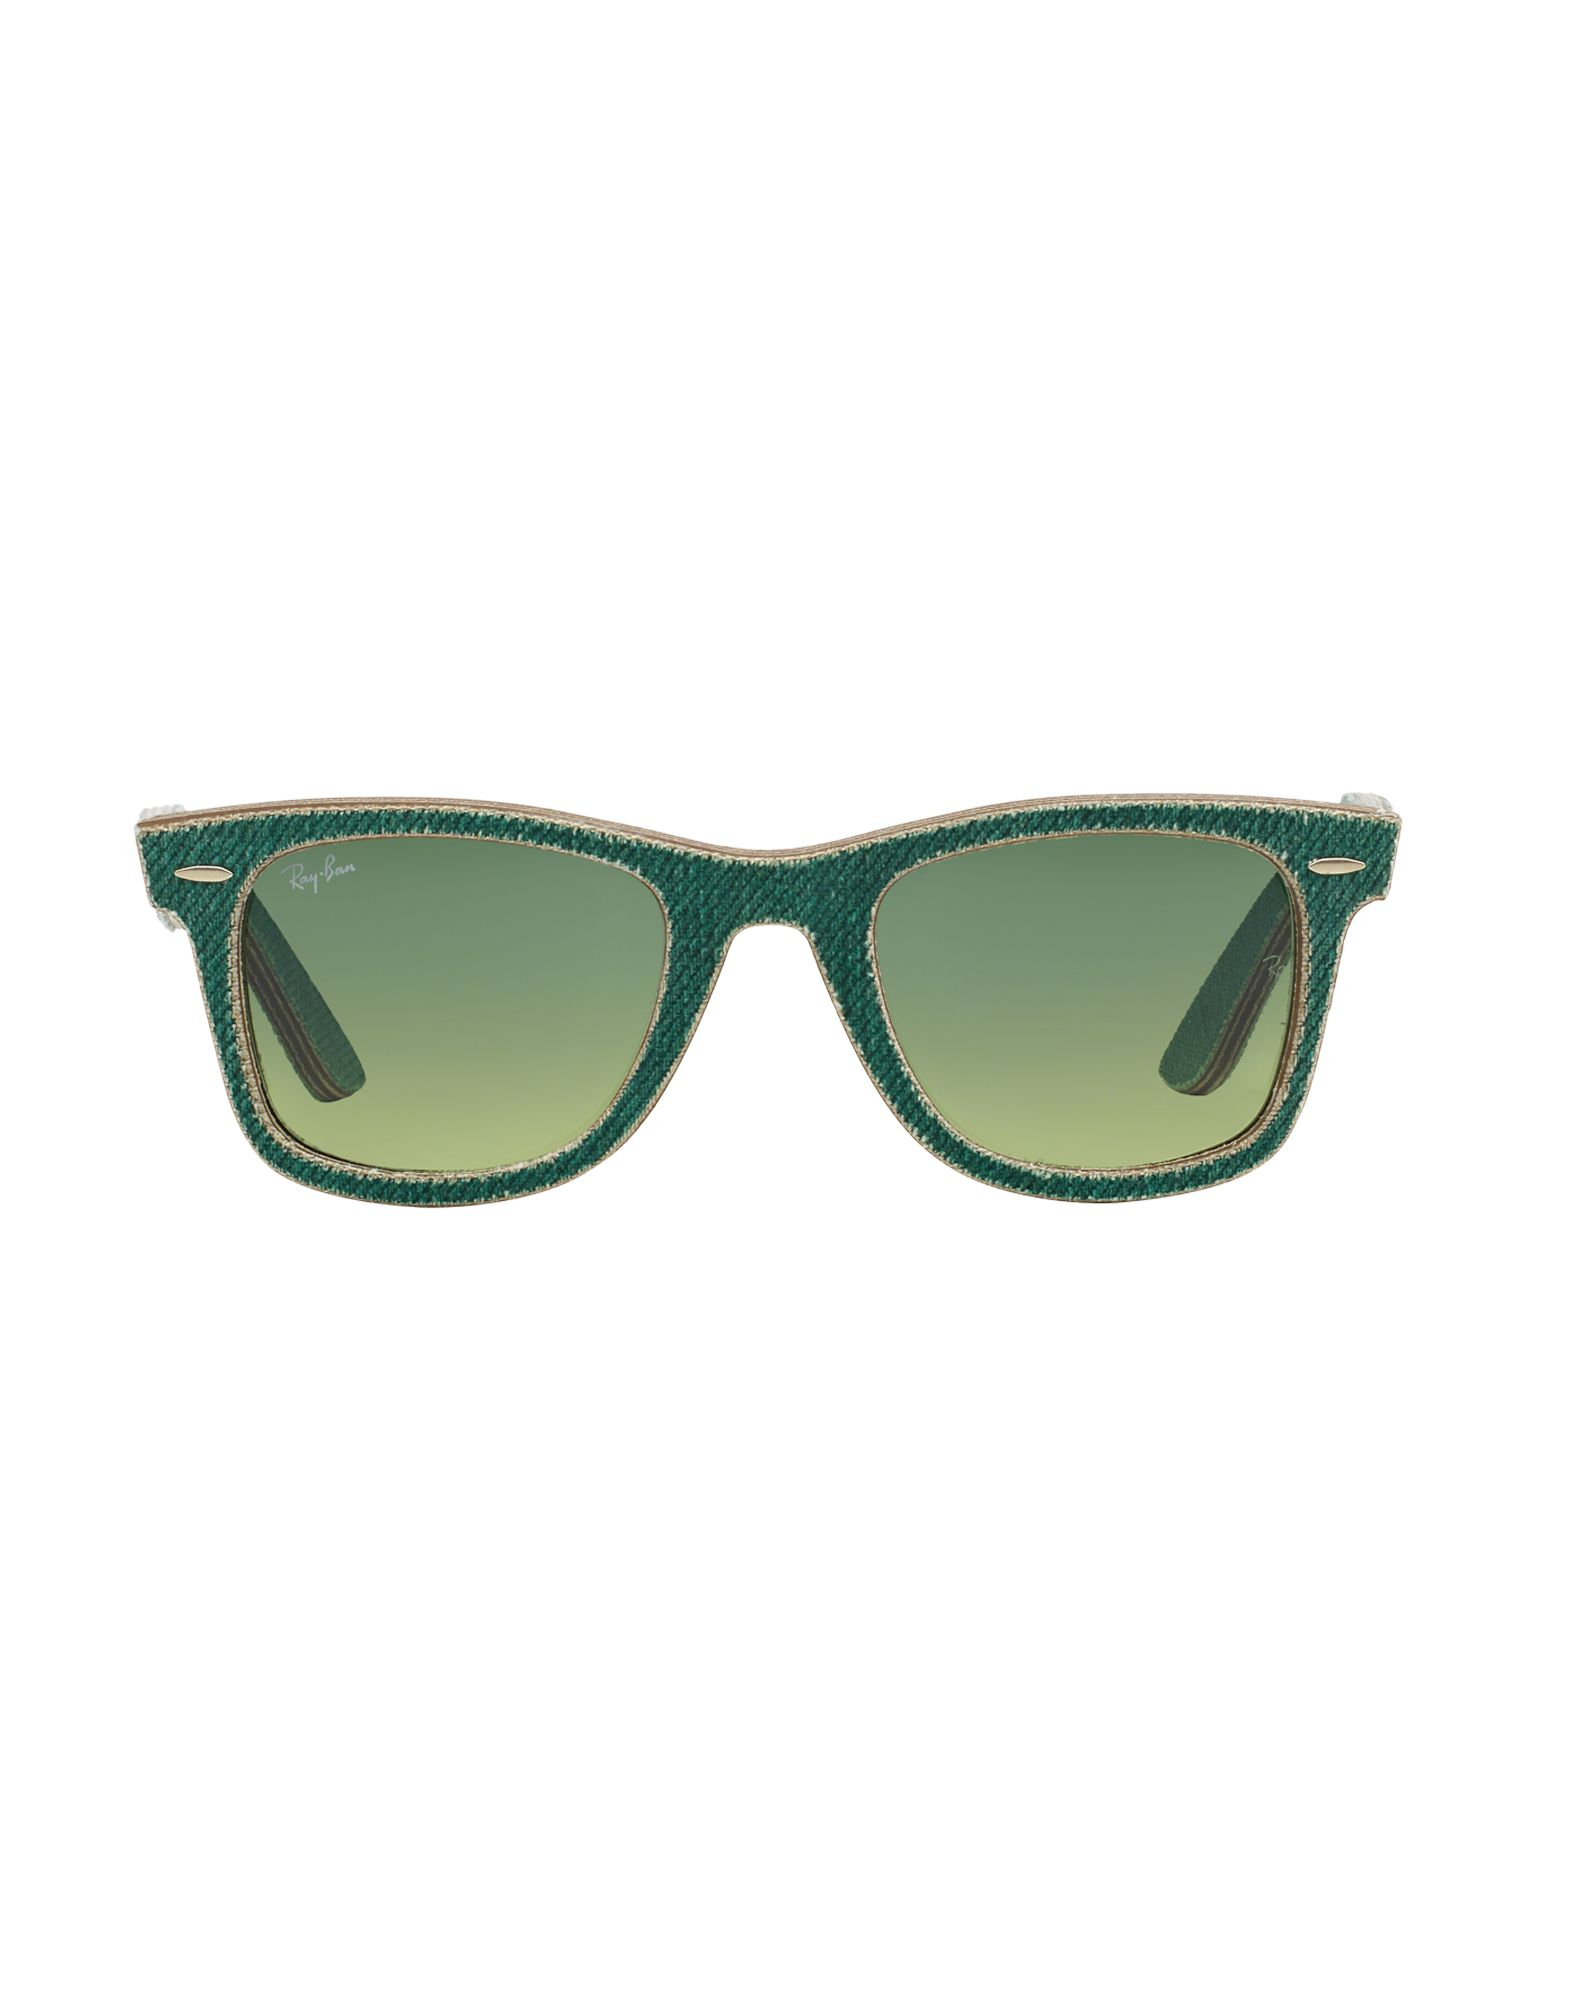 Ray Ban Frames Green | Louisiana Bucket Brigade